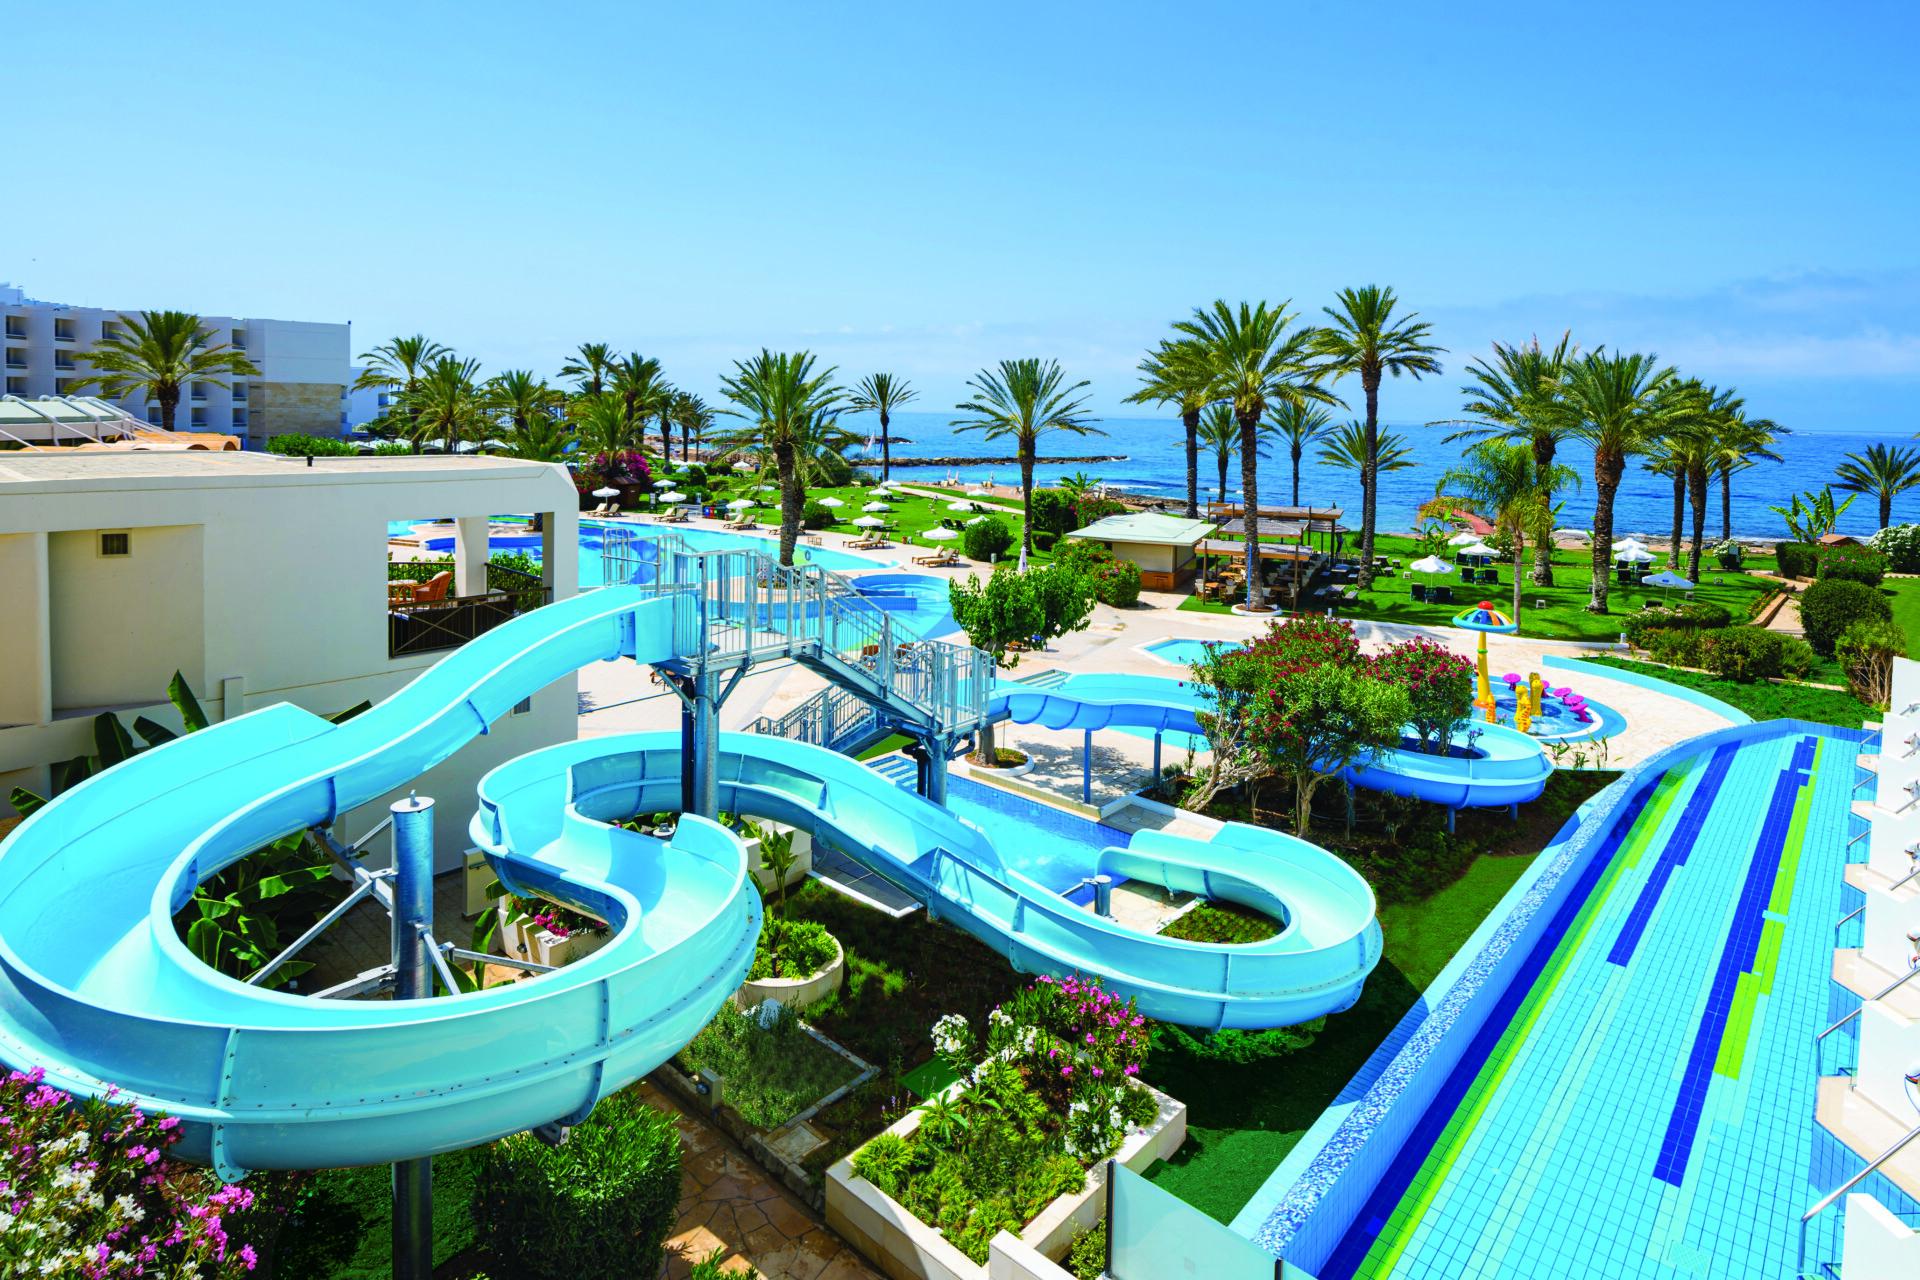 66 ATHENA BEACH HOTEL OASIS SPLASH